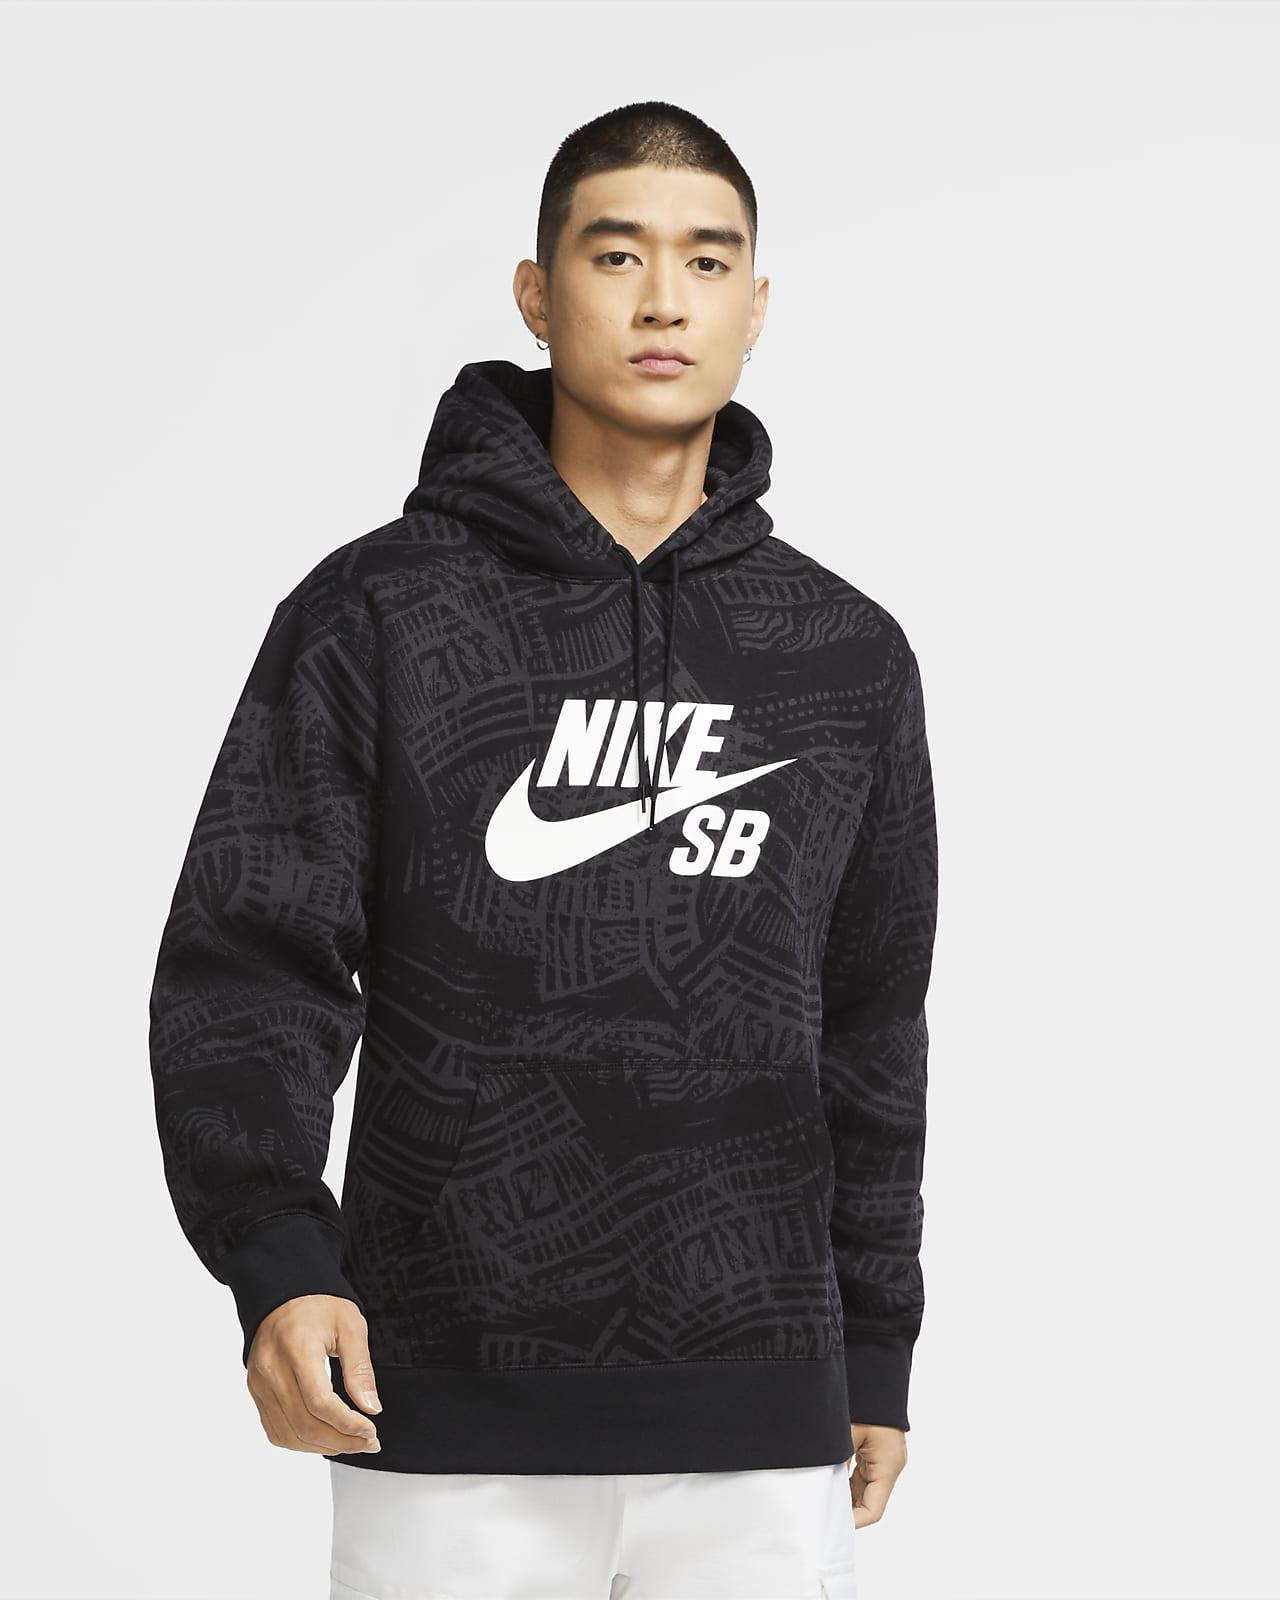 Męska bluza z kapturem i nadrukiem do skateboardingu Nike SB